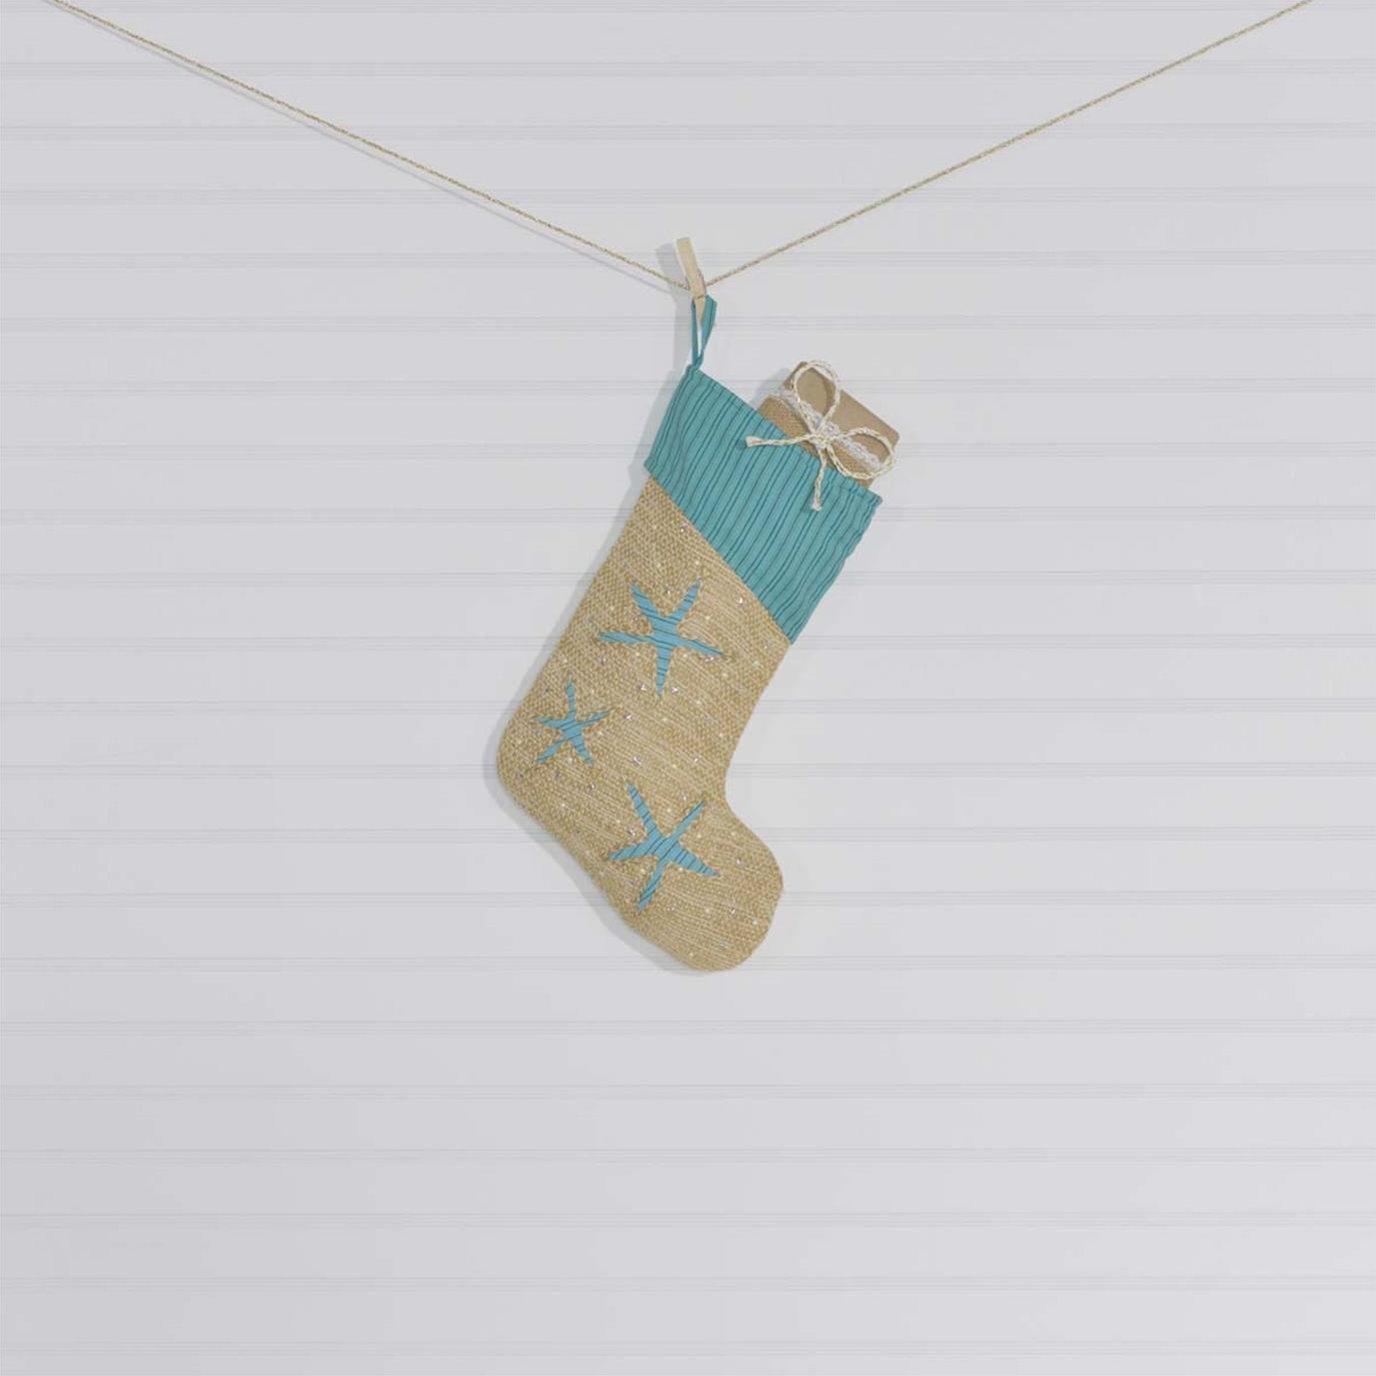 Nerine Stocking 11x15